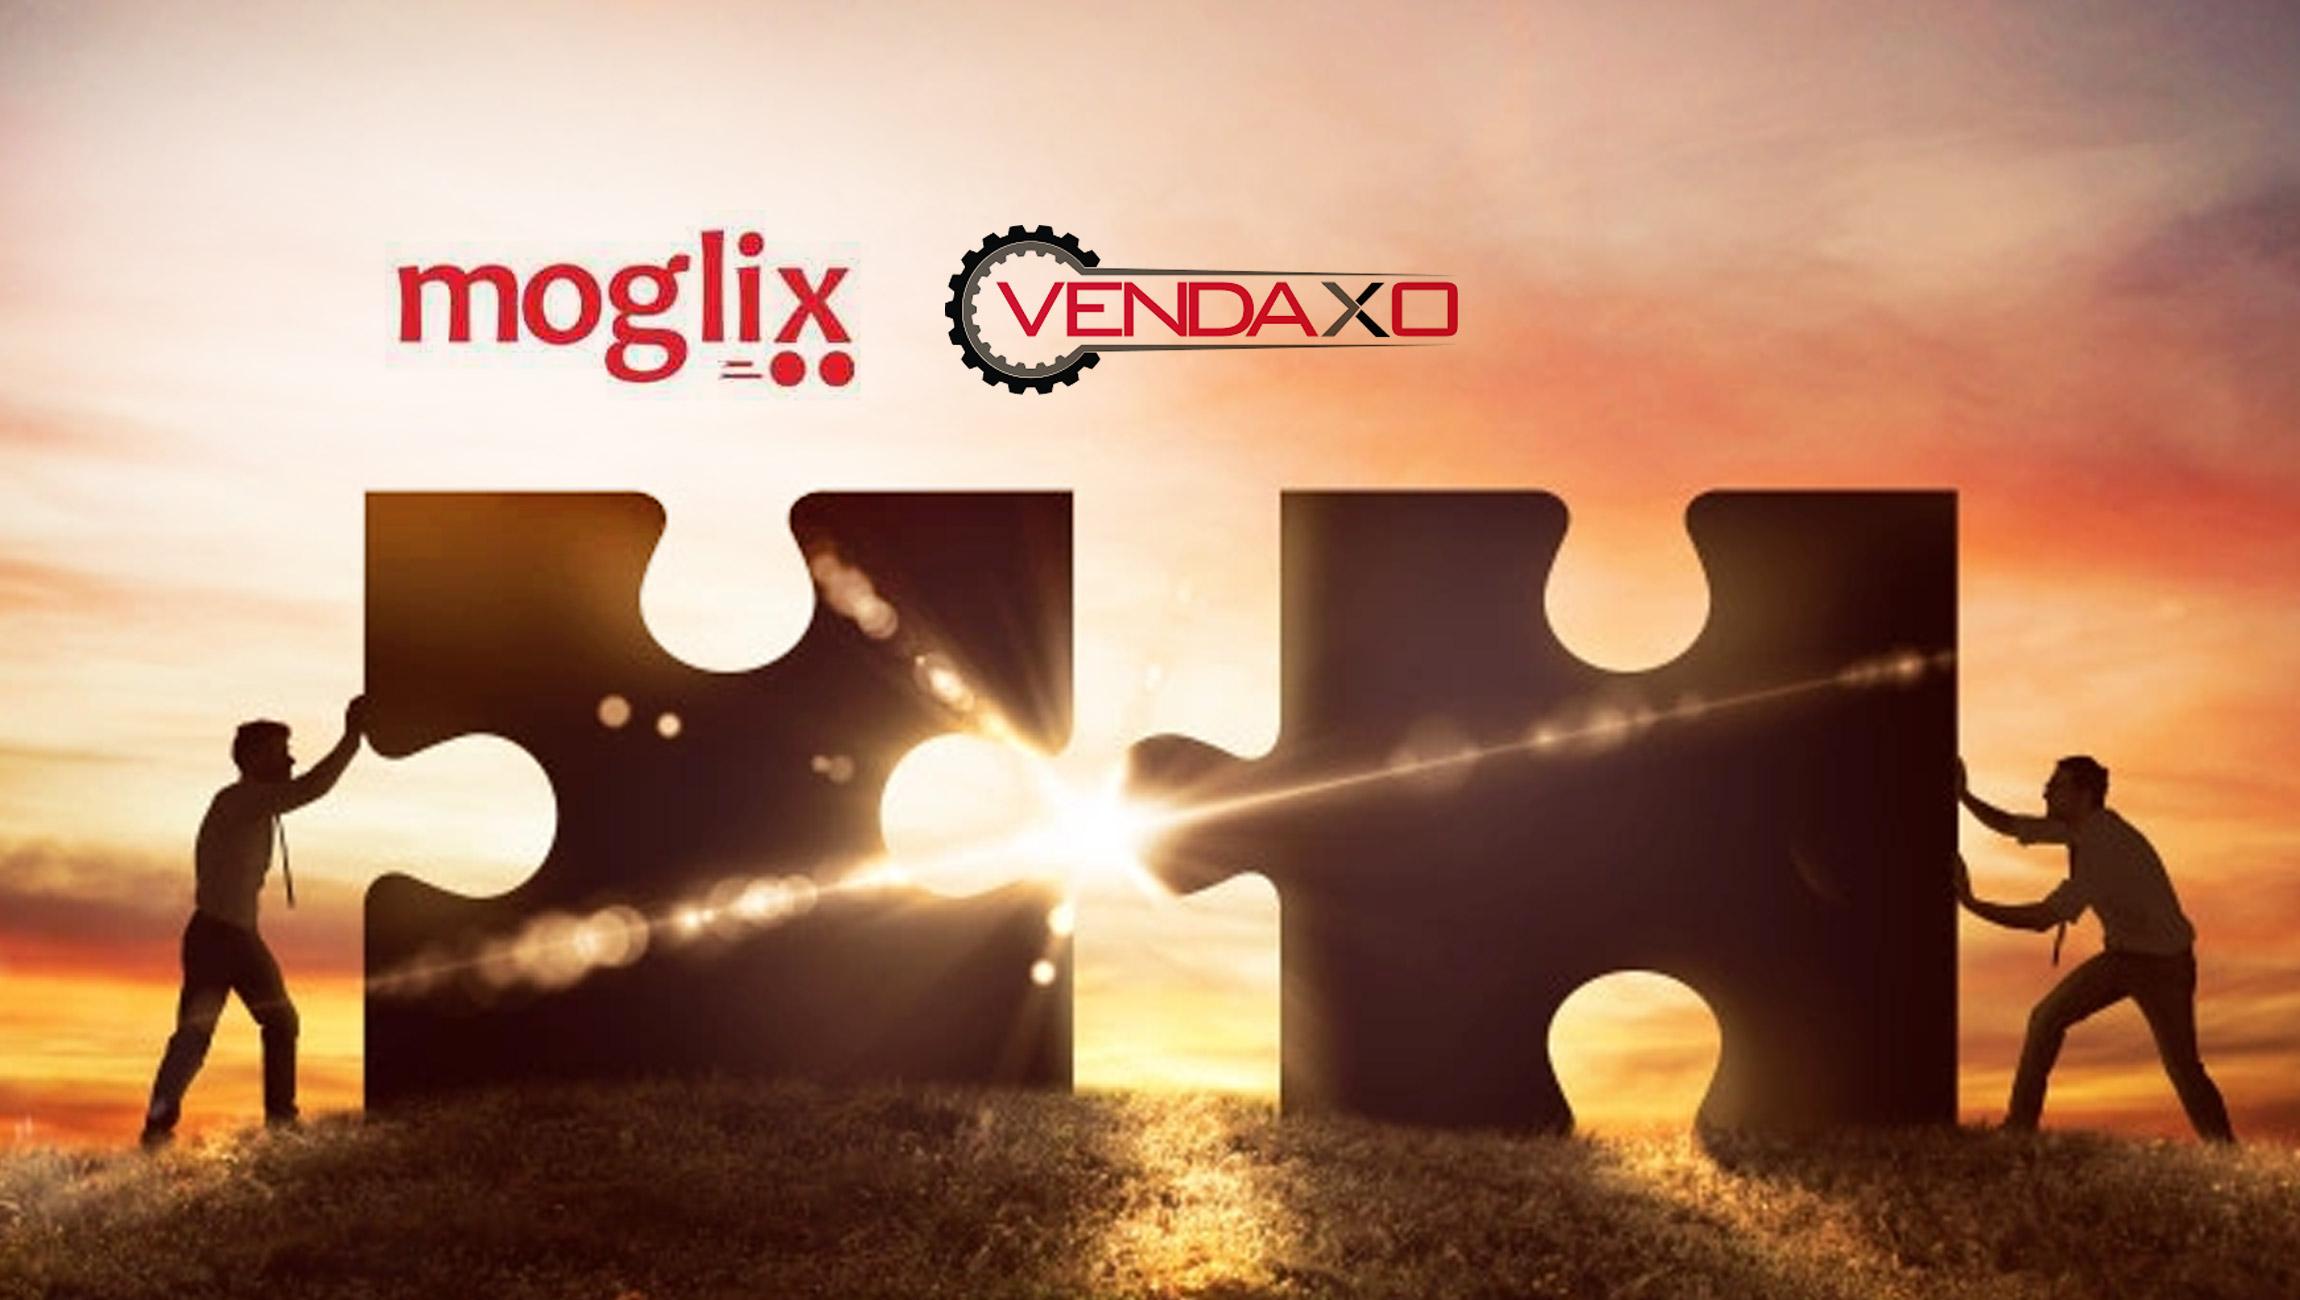 B2B Commerce Unicorn Moglix Acquires Vendaxo; A Marketplace for Used Machinery